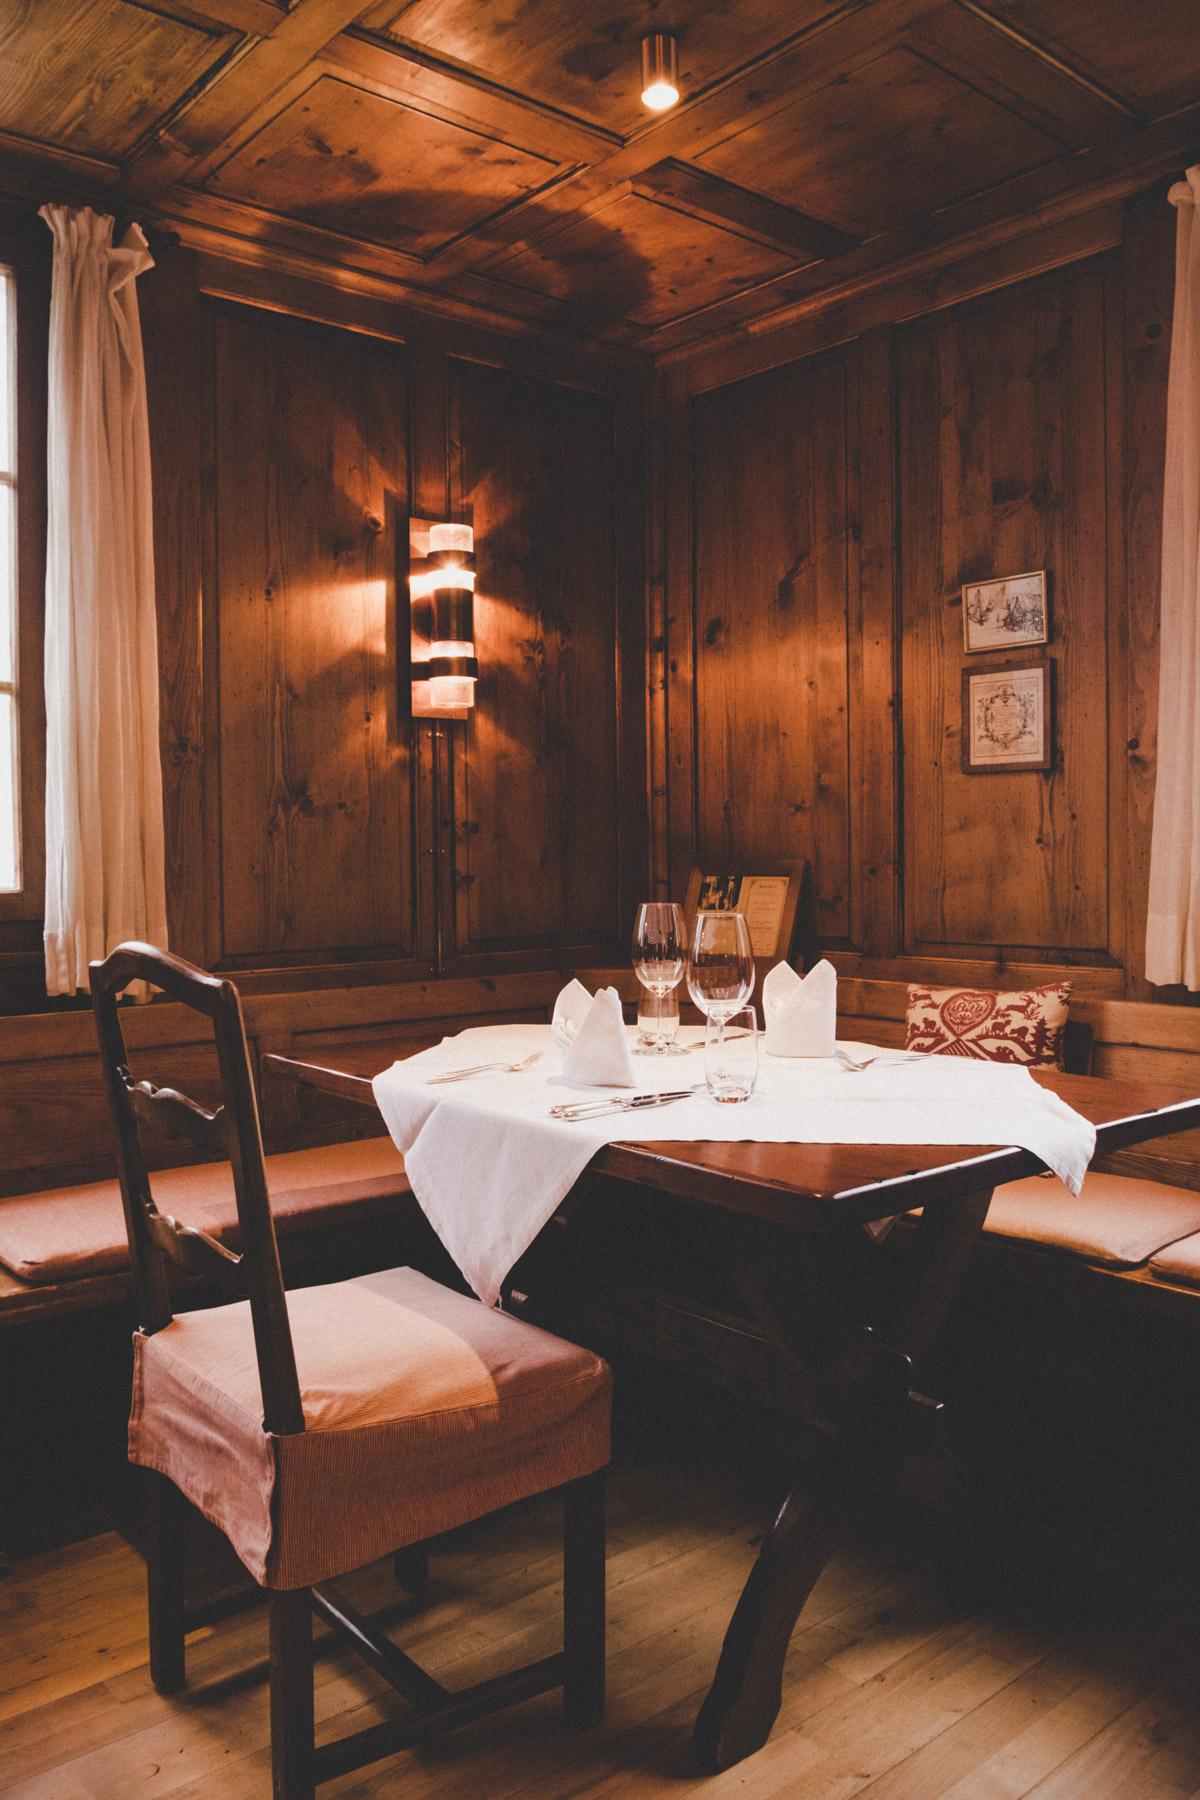 Hotel Hammer, Eigenthal | © individualicious